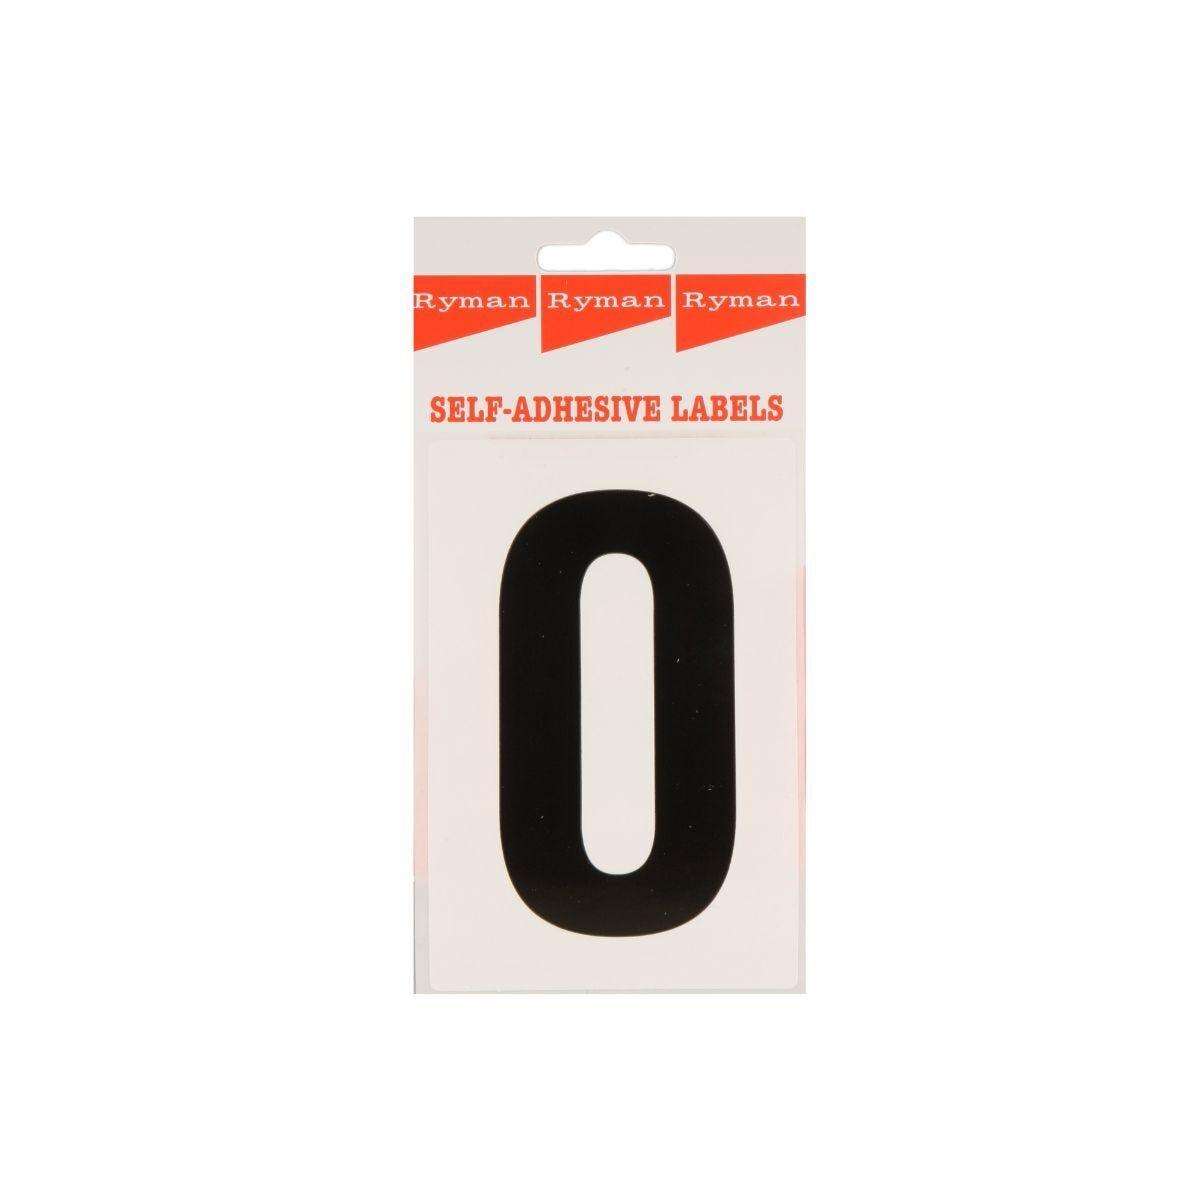 Ryman Self Adhesive Labels Number 0 Single Pack